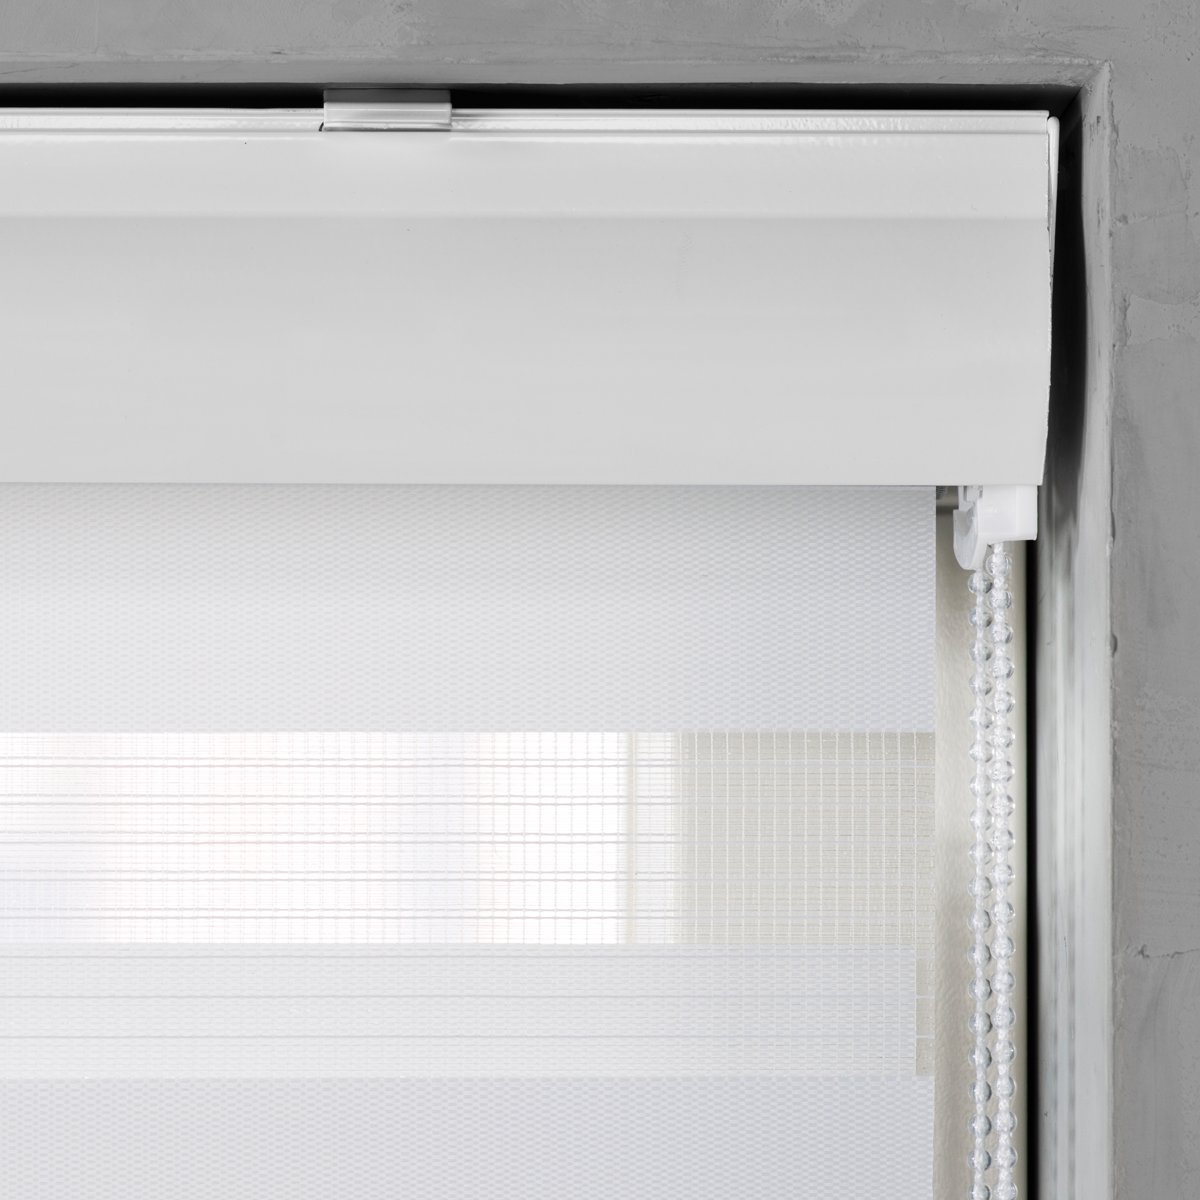 bol.com | Pure Living - Universele klemsteun voor draai / kiep ramen